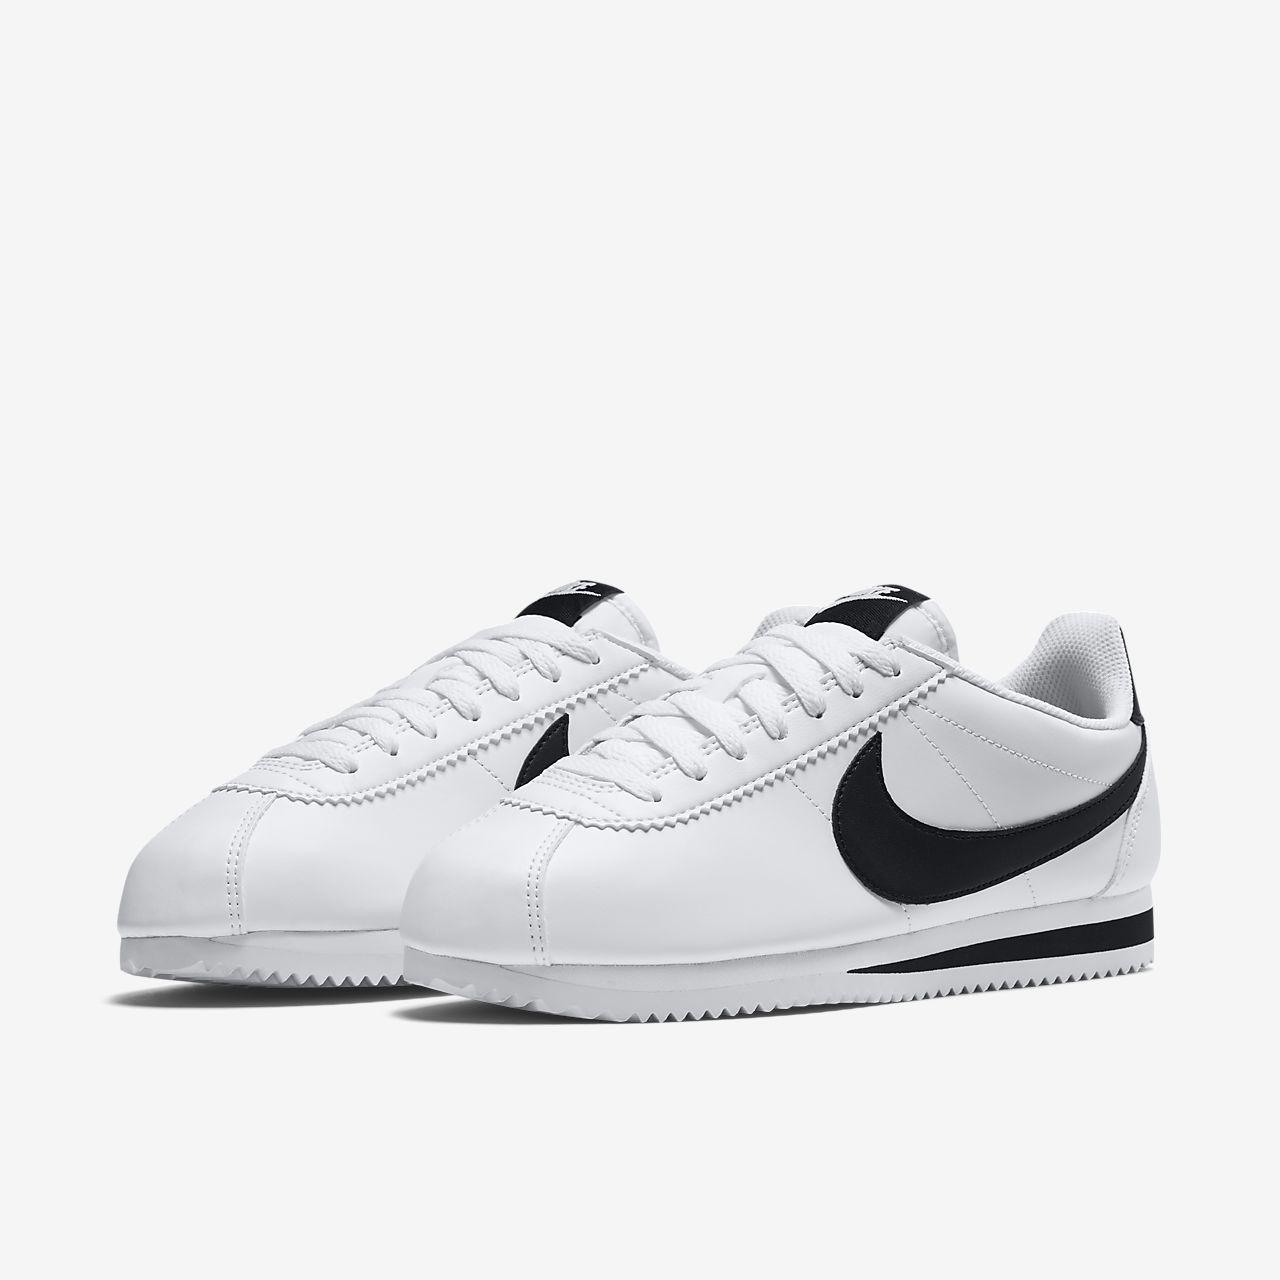 nike classic cortez womens tennis shoes